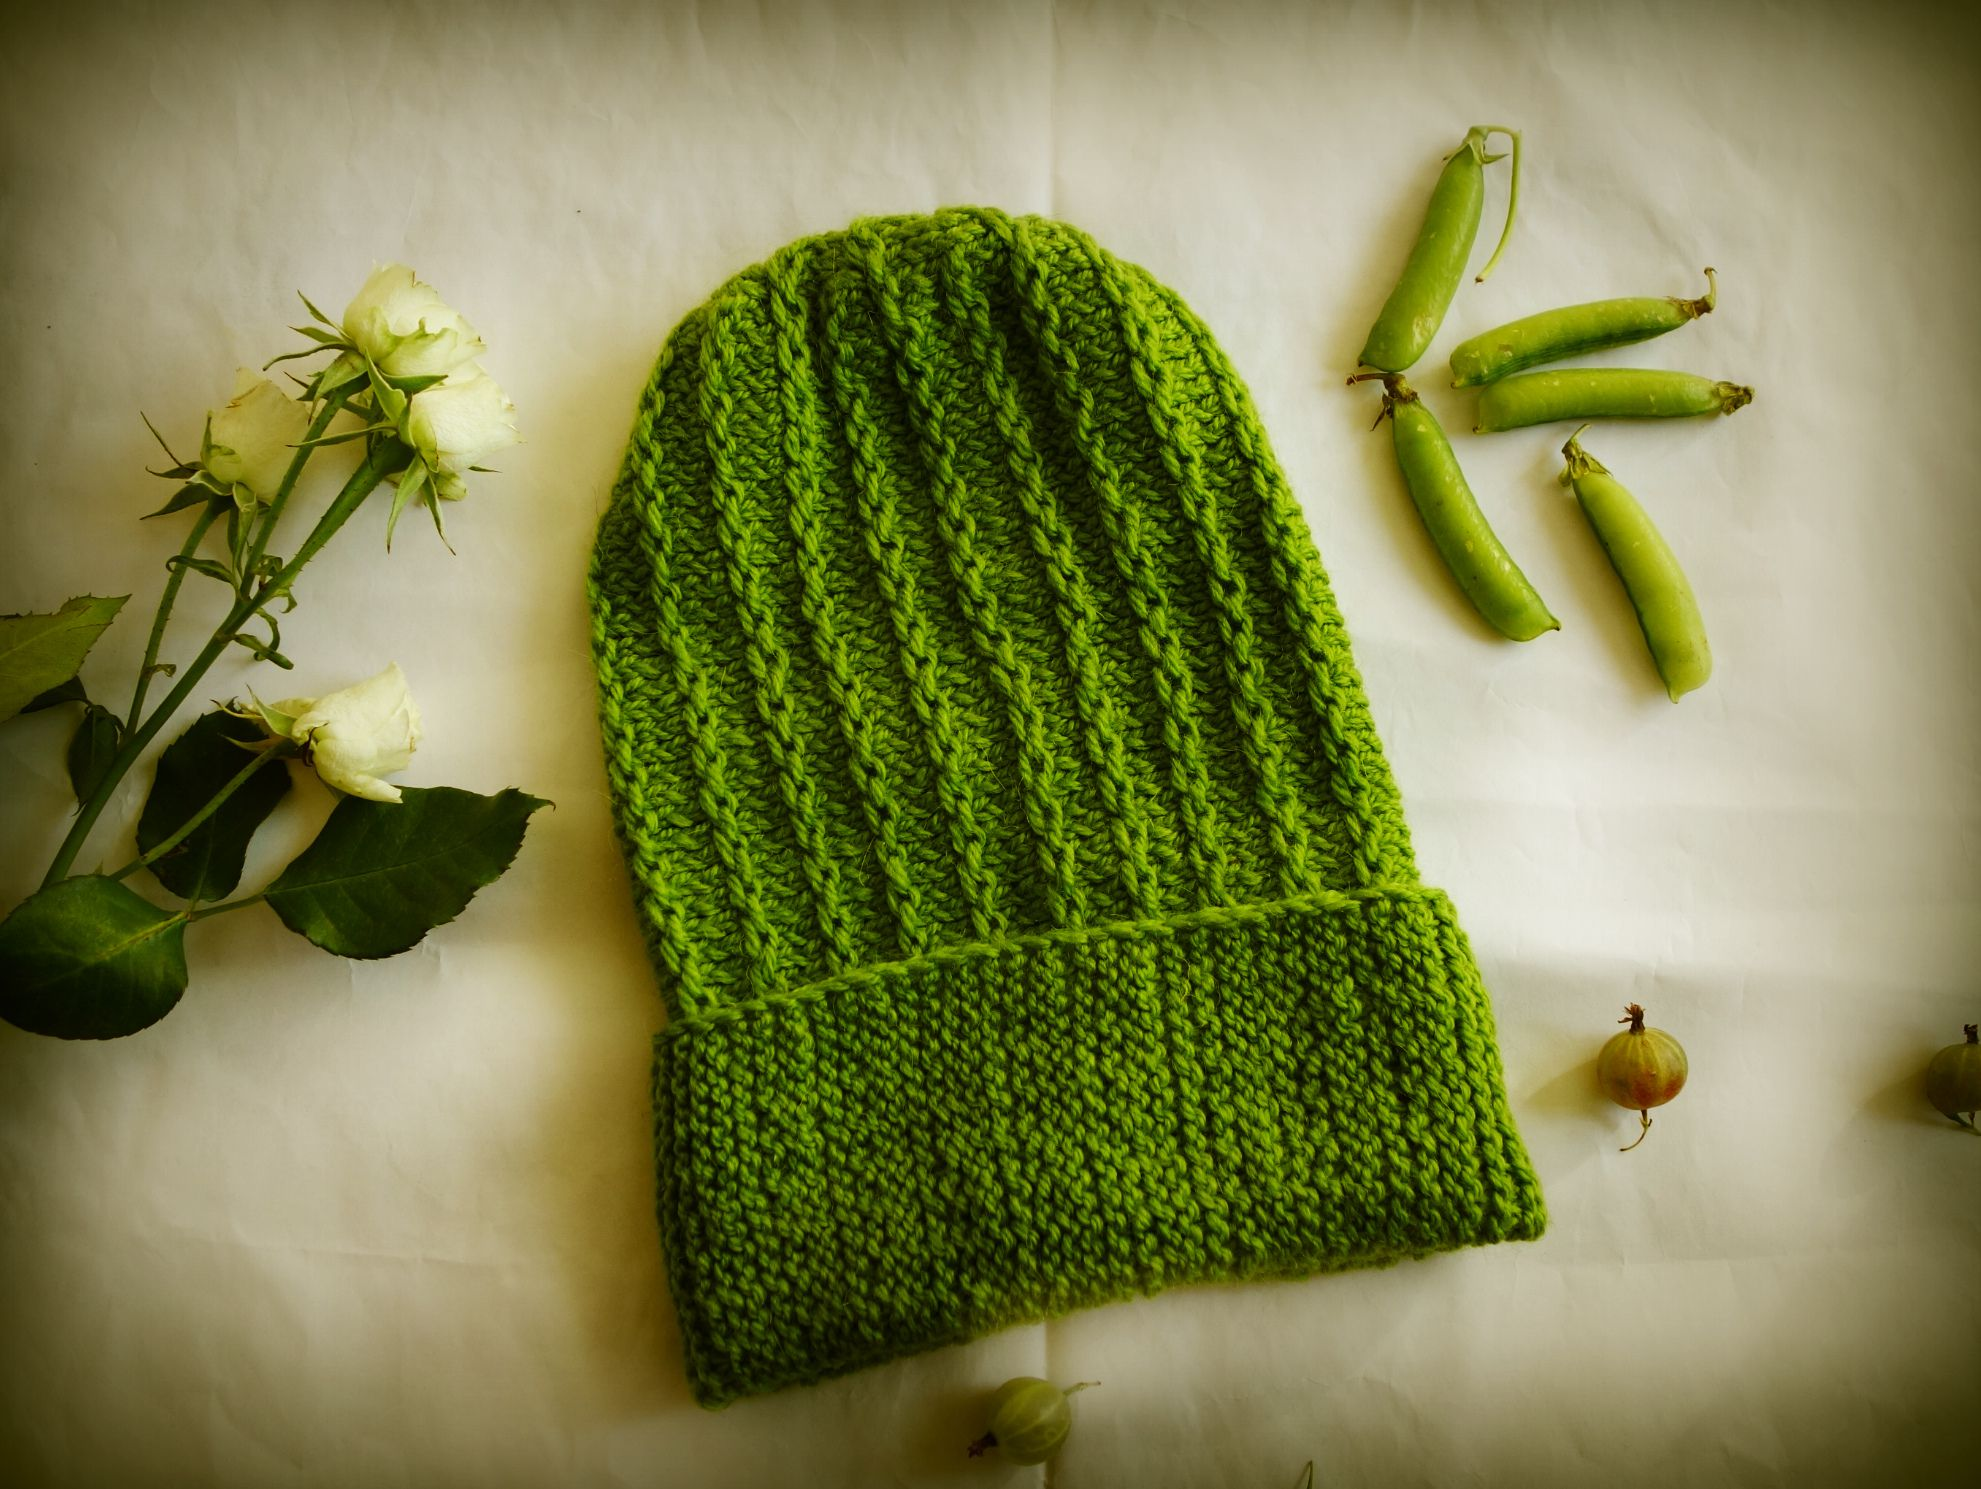 ручнаяработа подарок вязание шапкавязаная зеленаяшапка шапкатыковка аксессуар моднаяшапка шапкабини